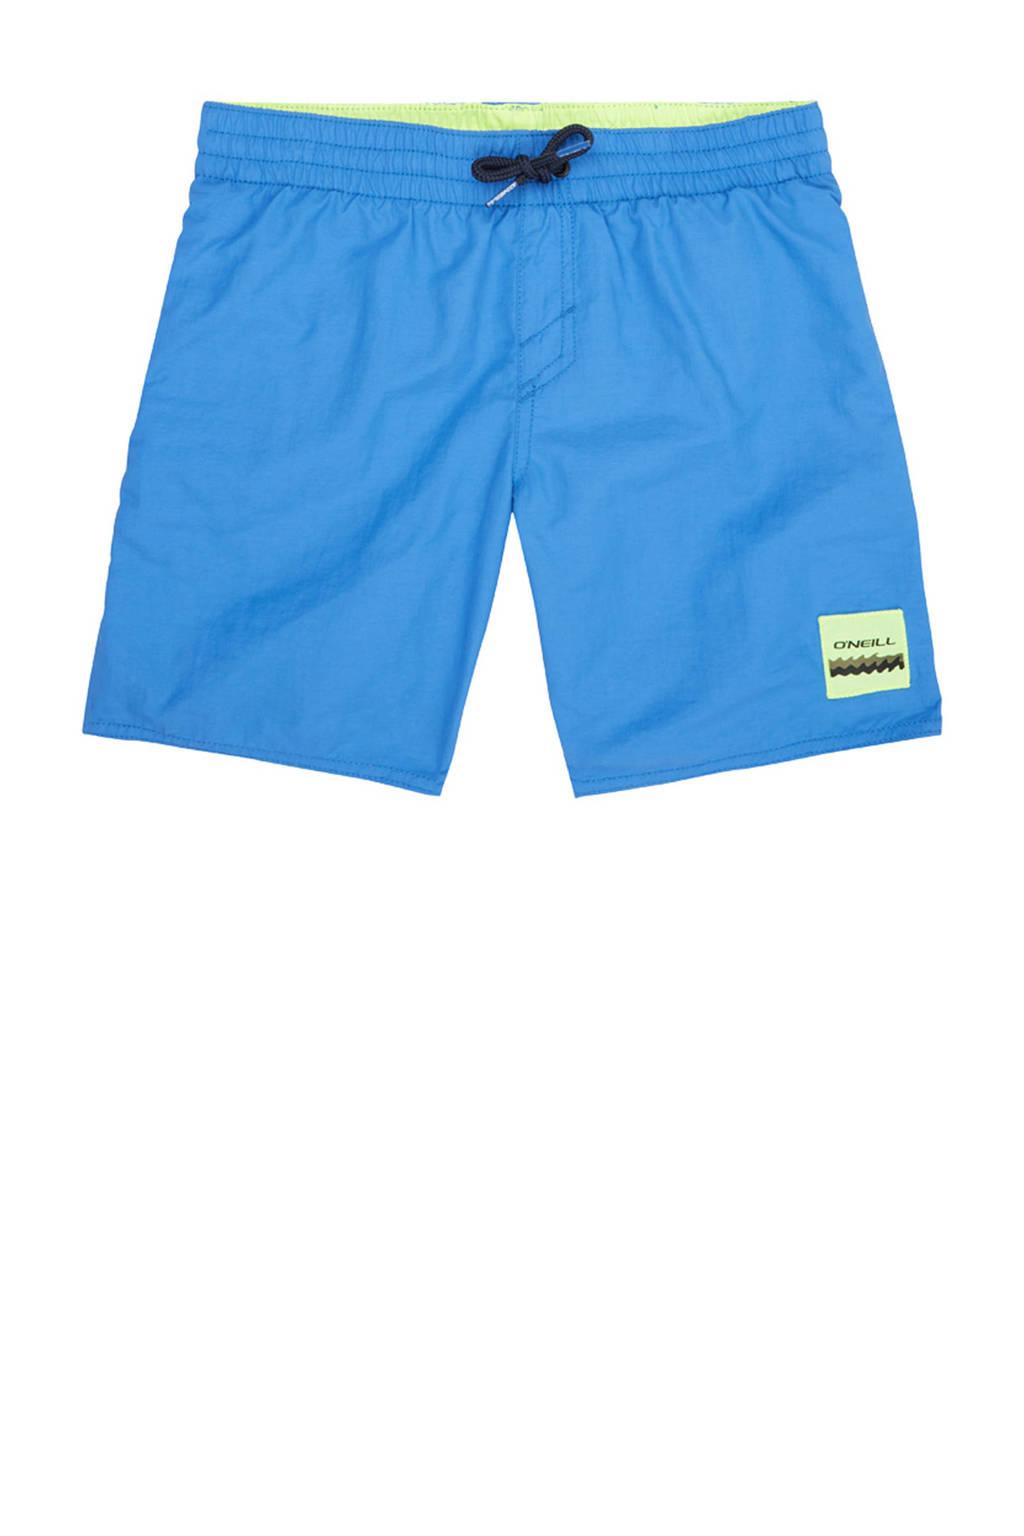 O'Neill zwemshort Vert blauw, Blauw